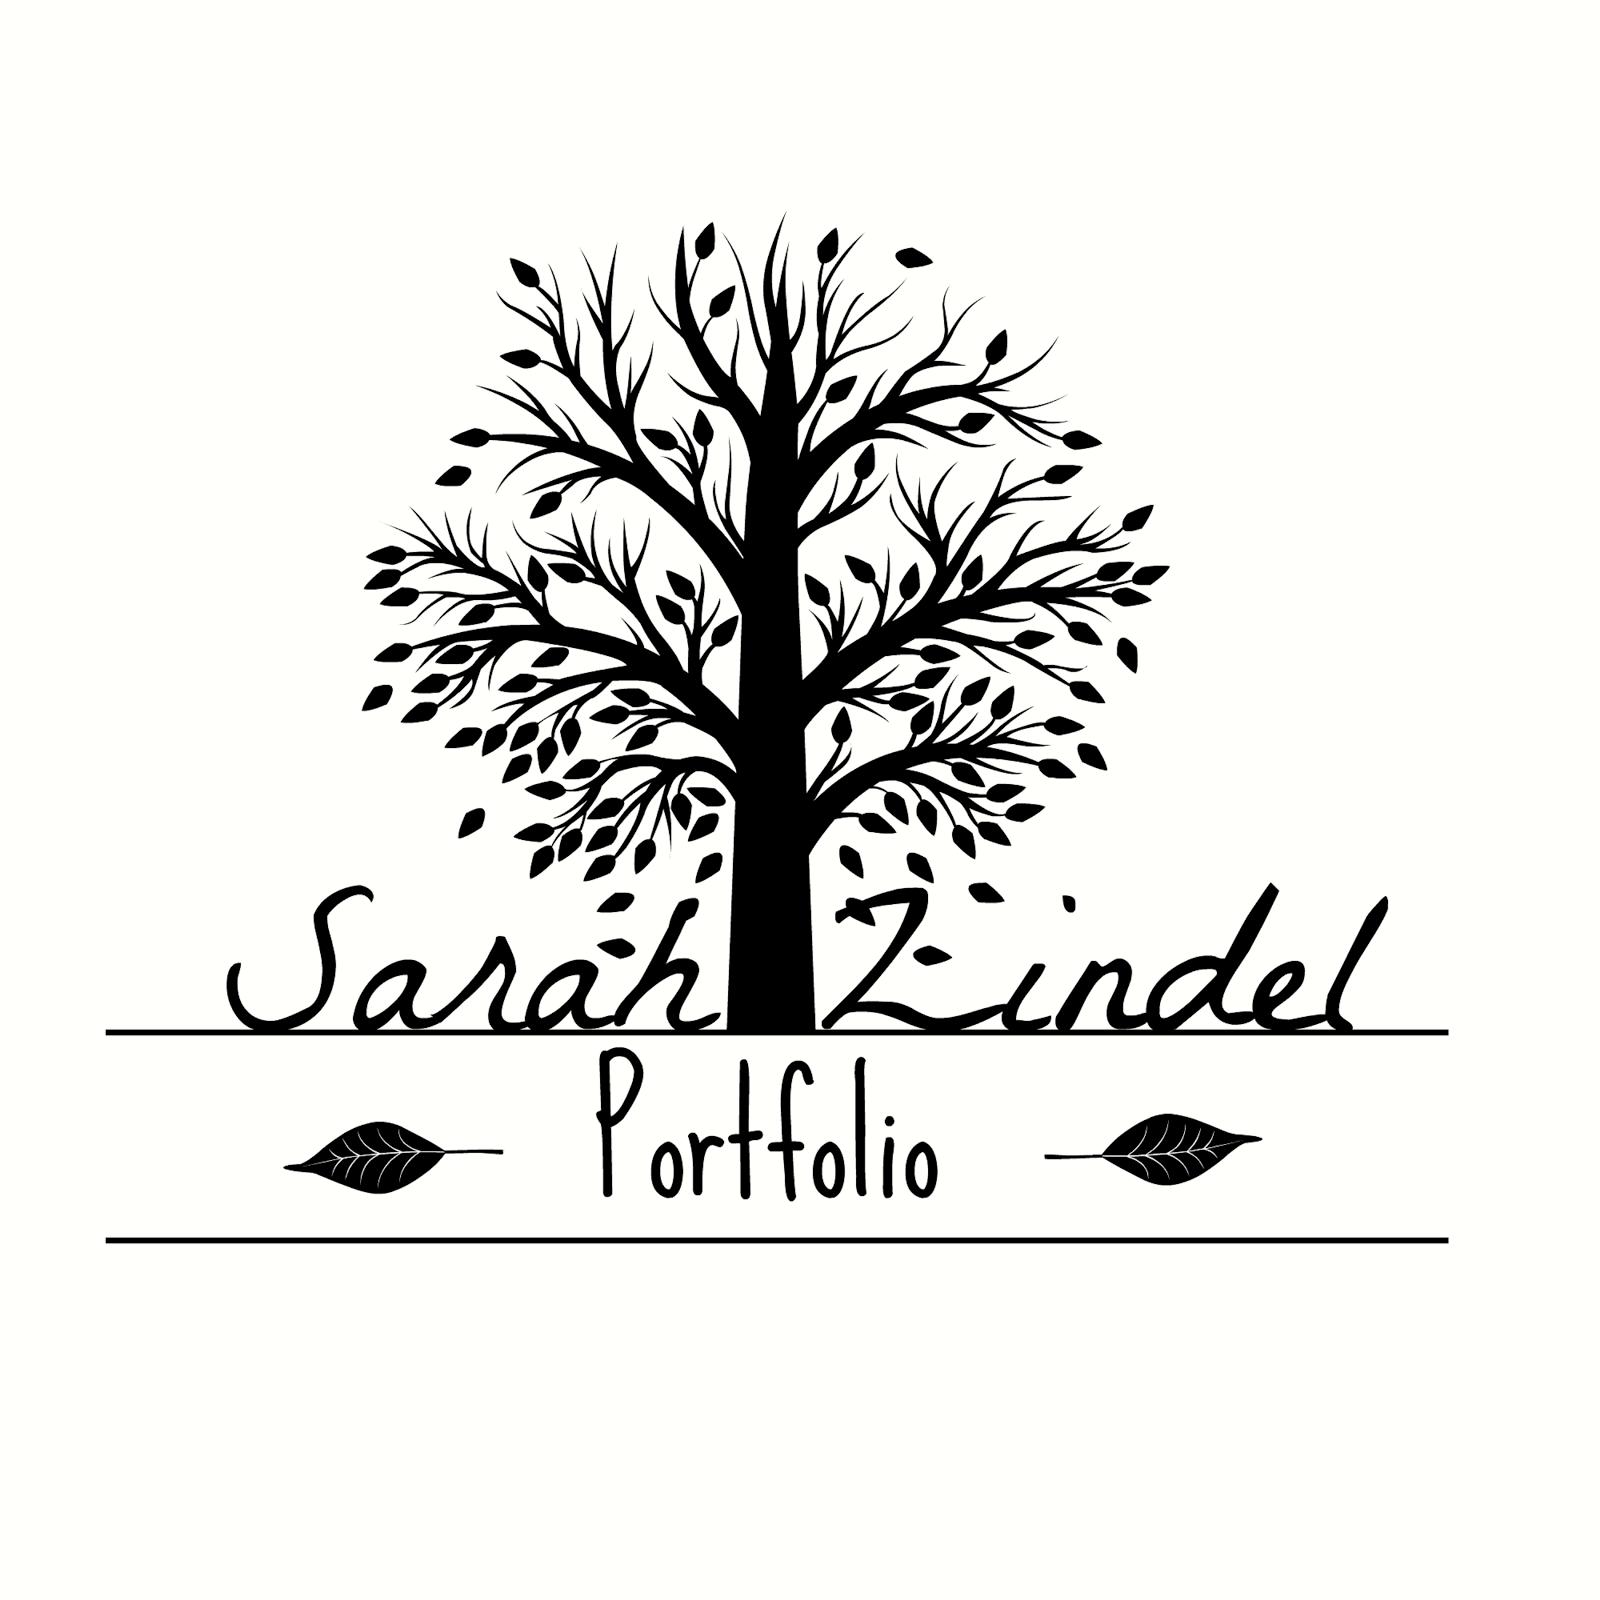 Portfolio: Sarah Zindel